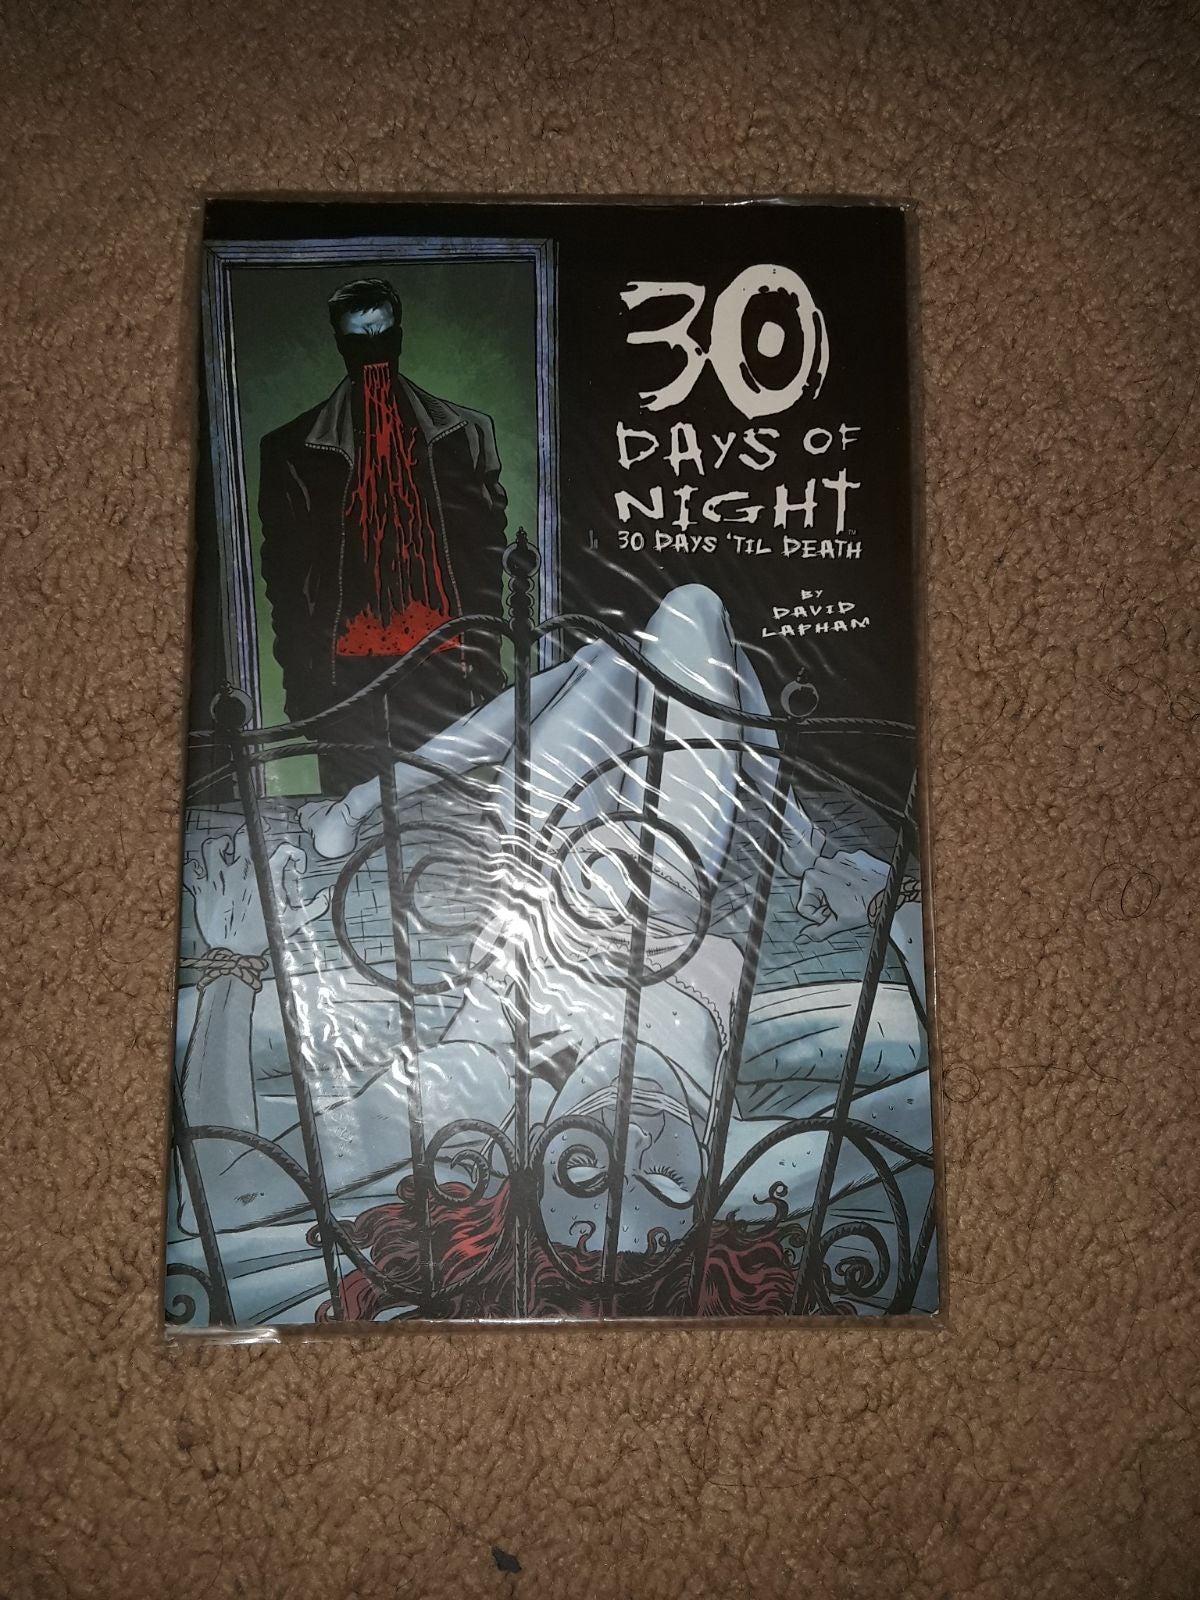 30 days of night 30 days of death